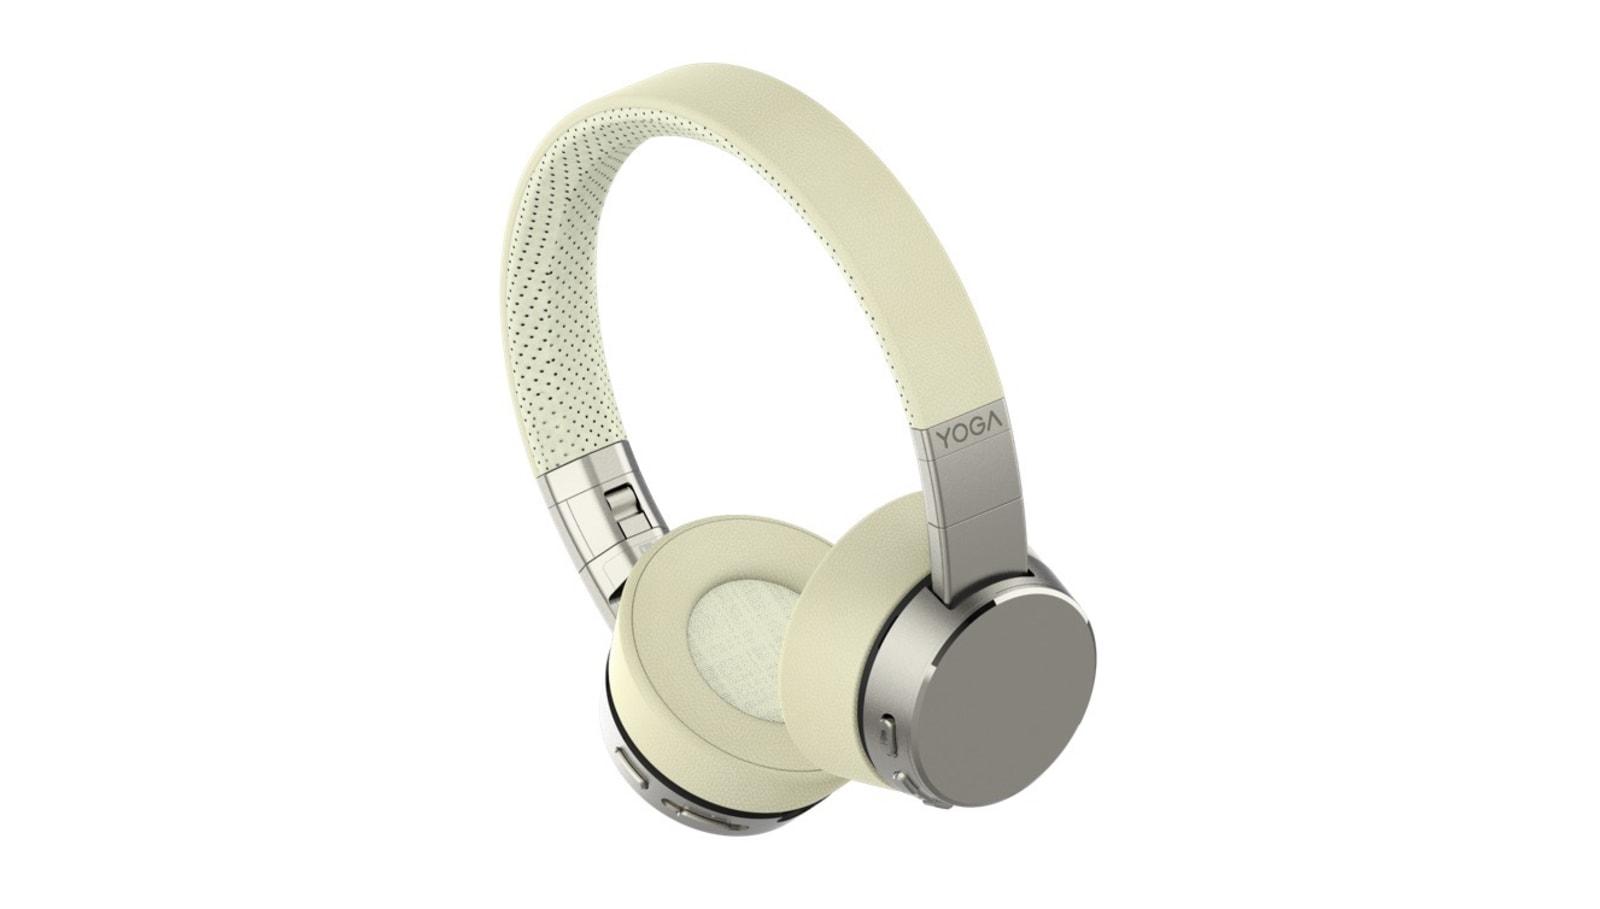 Lenovo Yoga ANC headphones